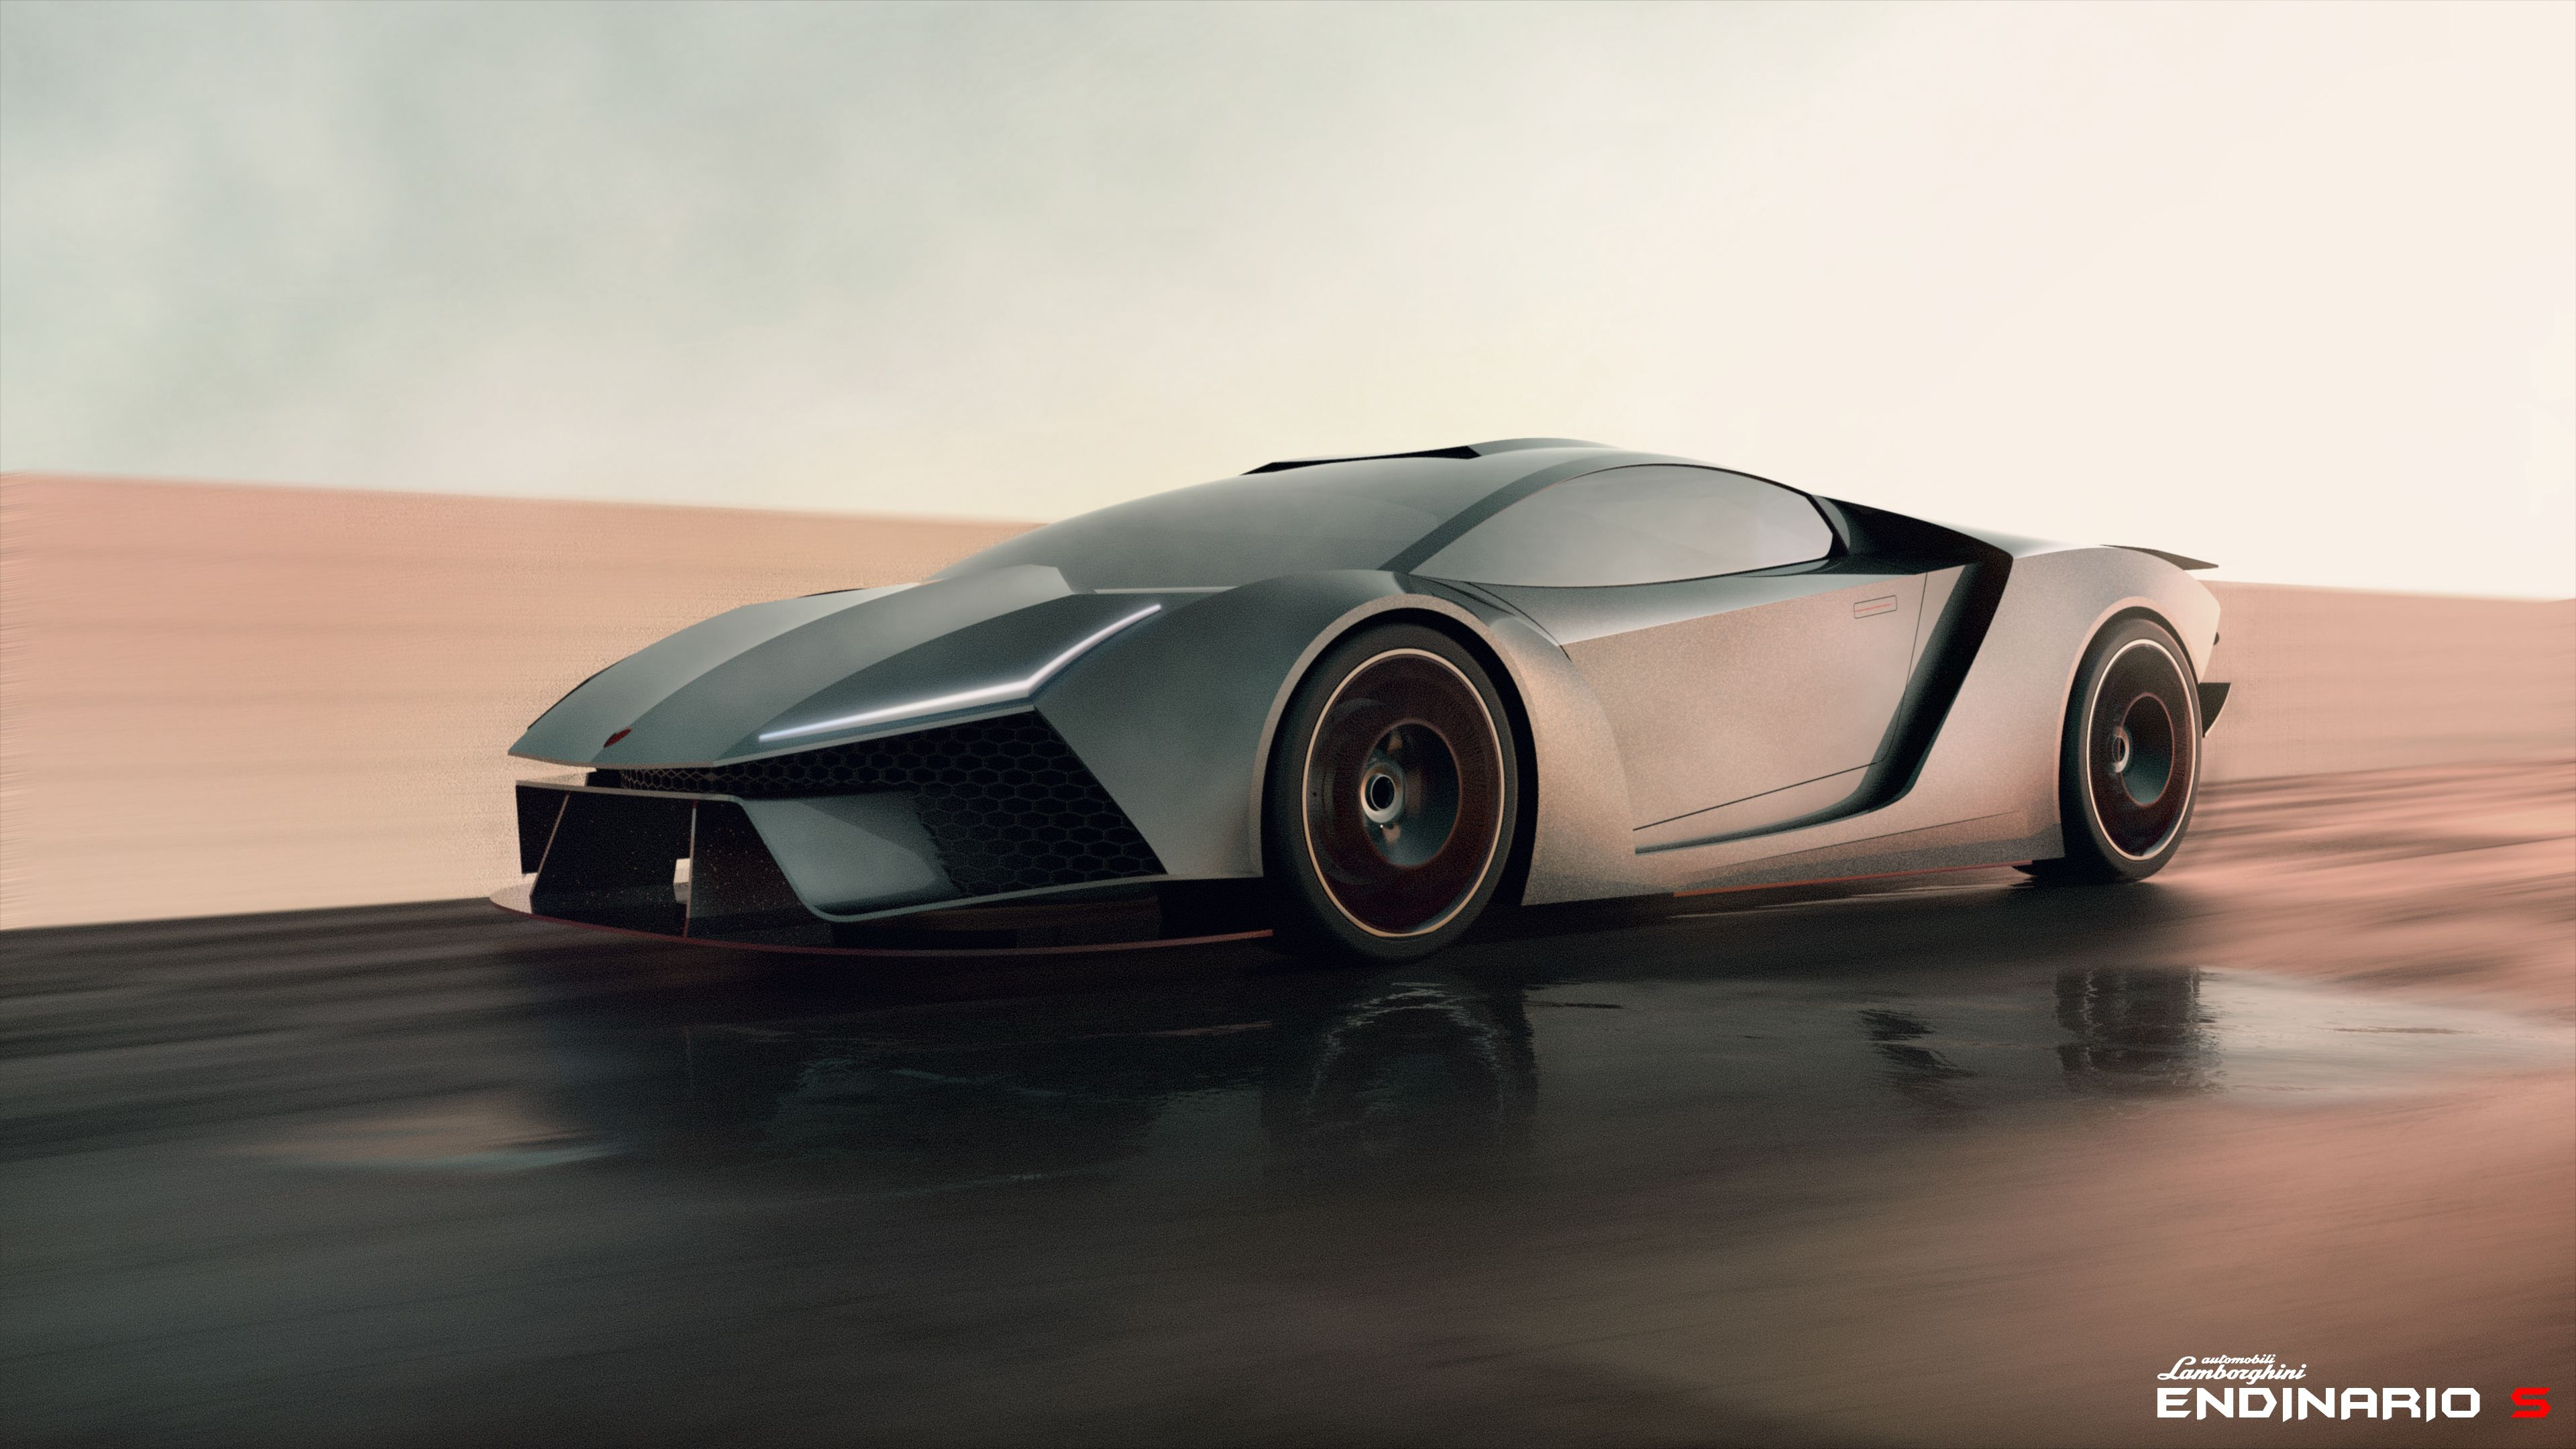 Lamborghini Endinario S 4k lamborghini wallpapers, hd-wallpapers, cars wallpaper…